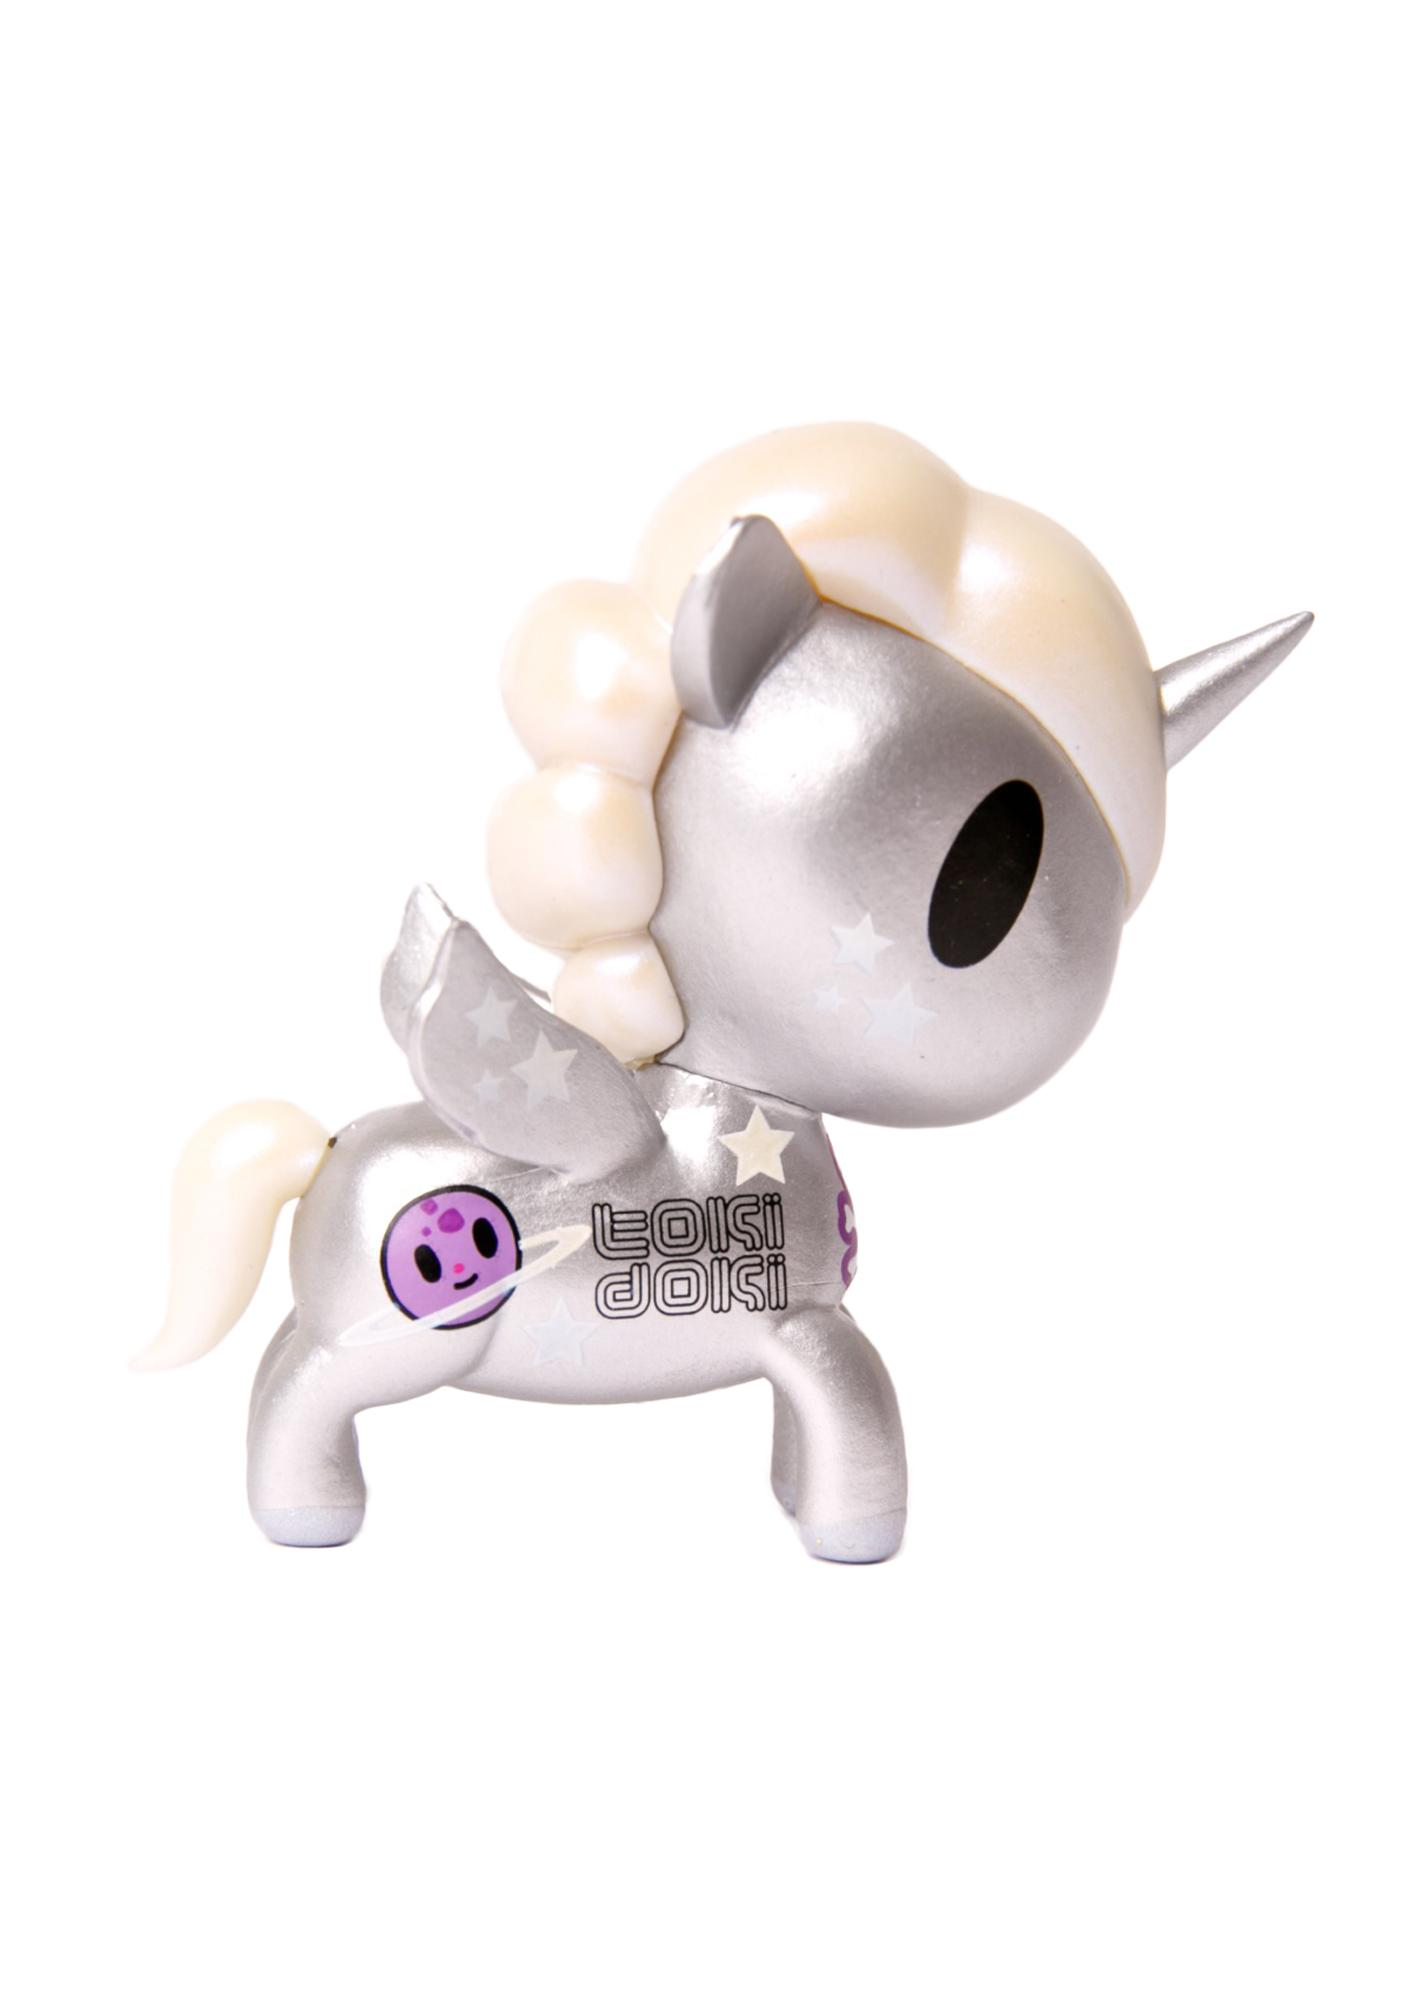 Tokidoki Unicorno Blind Box Mini Series 3